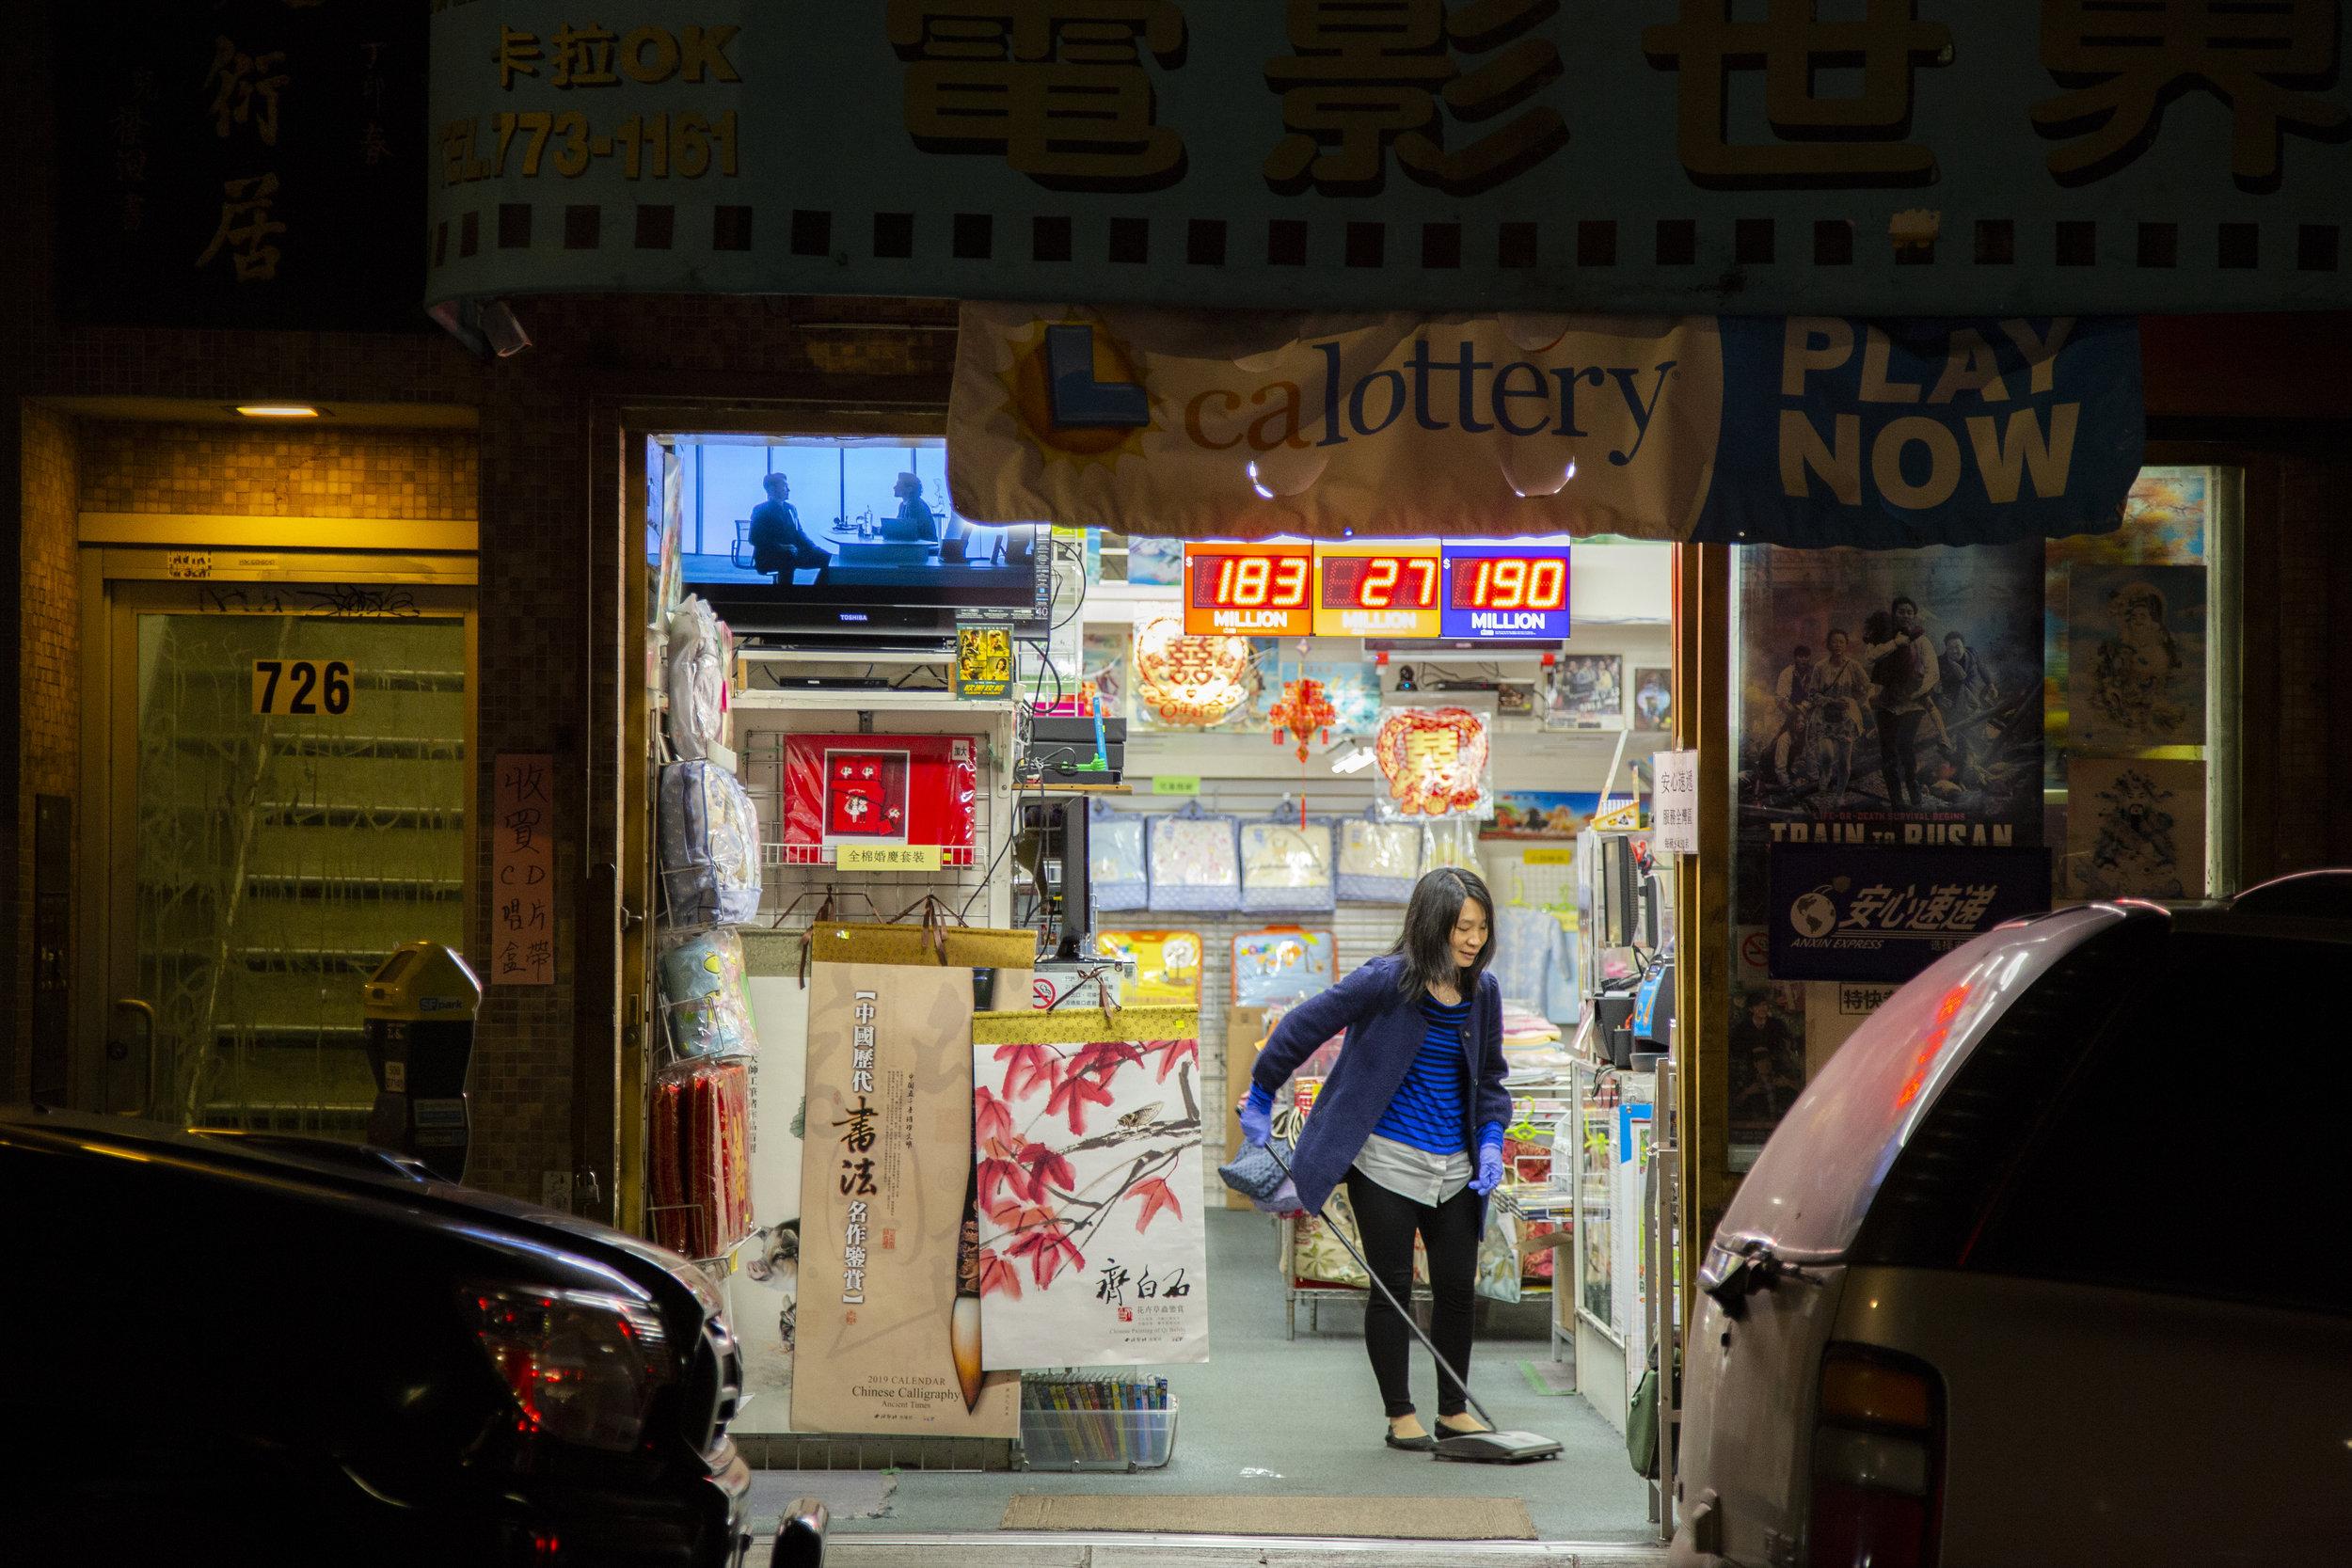 CultureTripxChinatown-cs-04.JPG